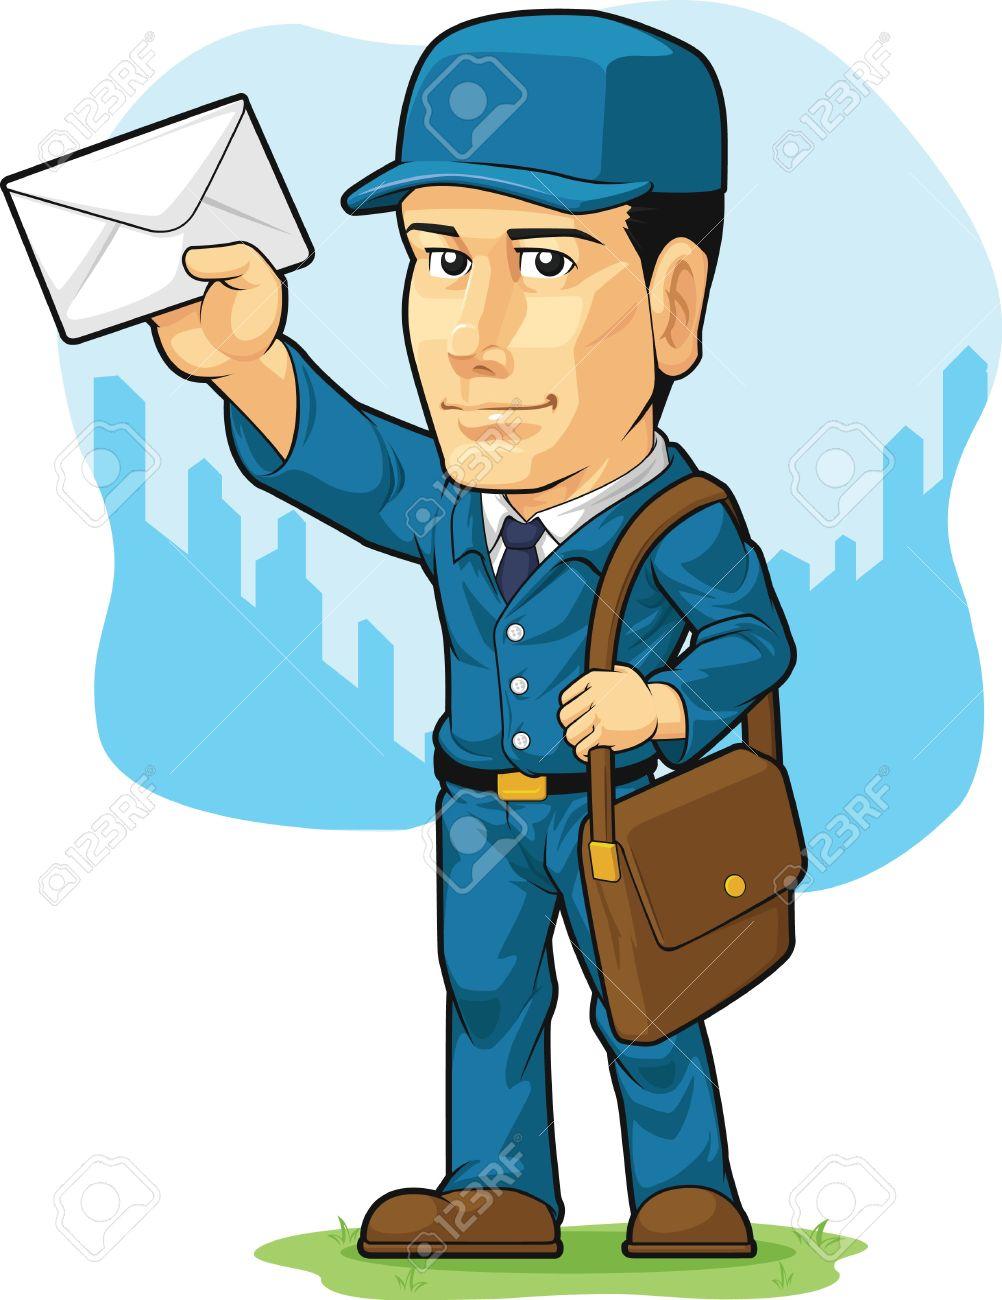 http://previews.123rf.com/images/bluezace/bluezace1303/bluezace130300008/18758848-Cartoon-of-Postman-or-Mailman-Stock-Vector.jpg